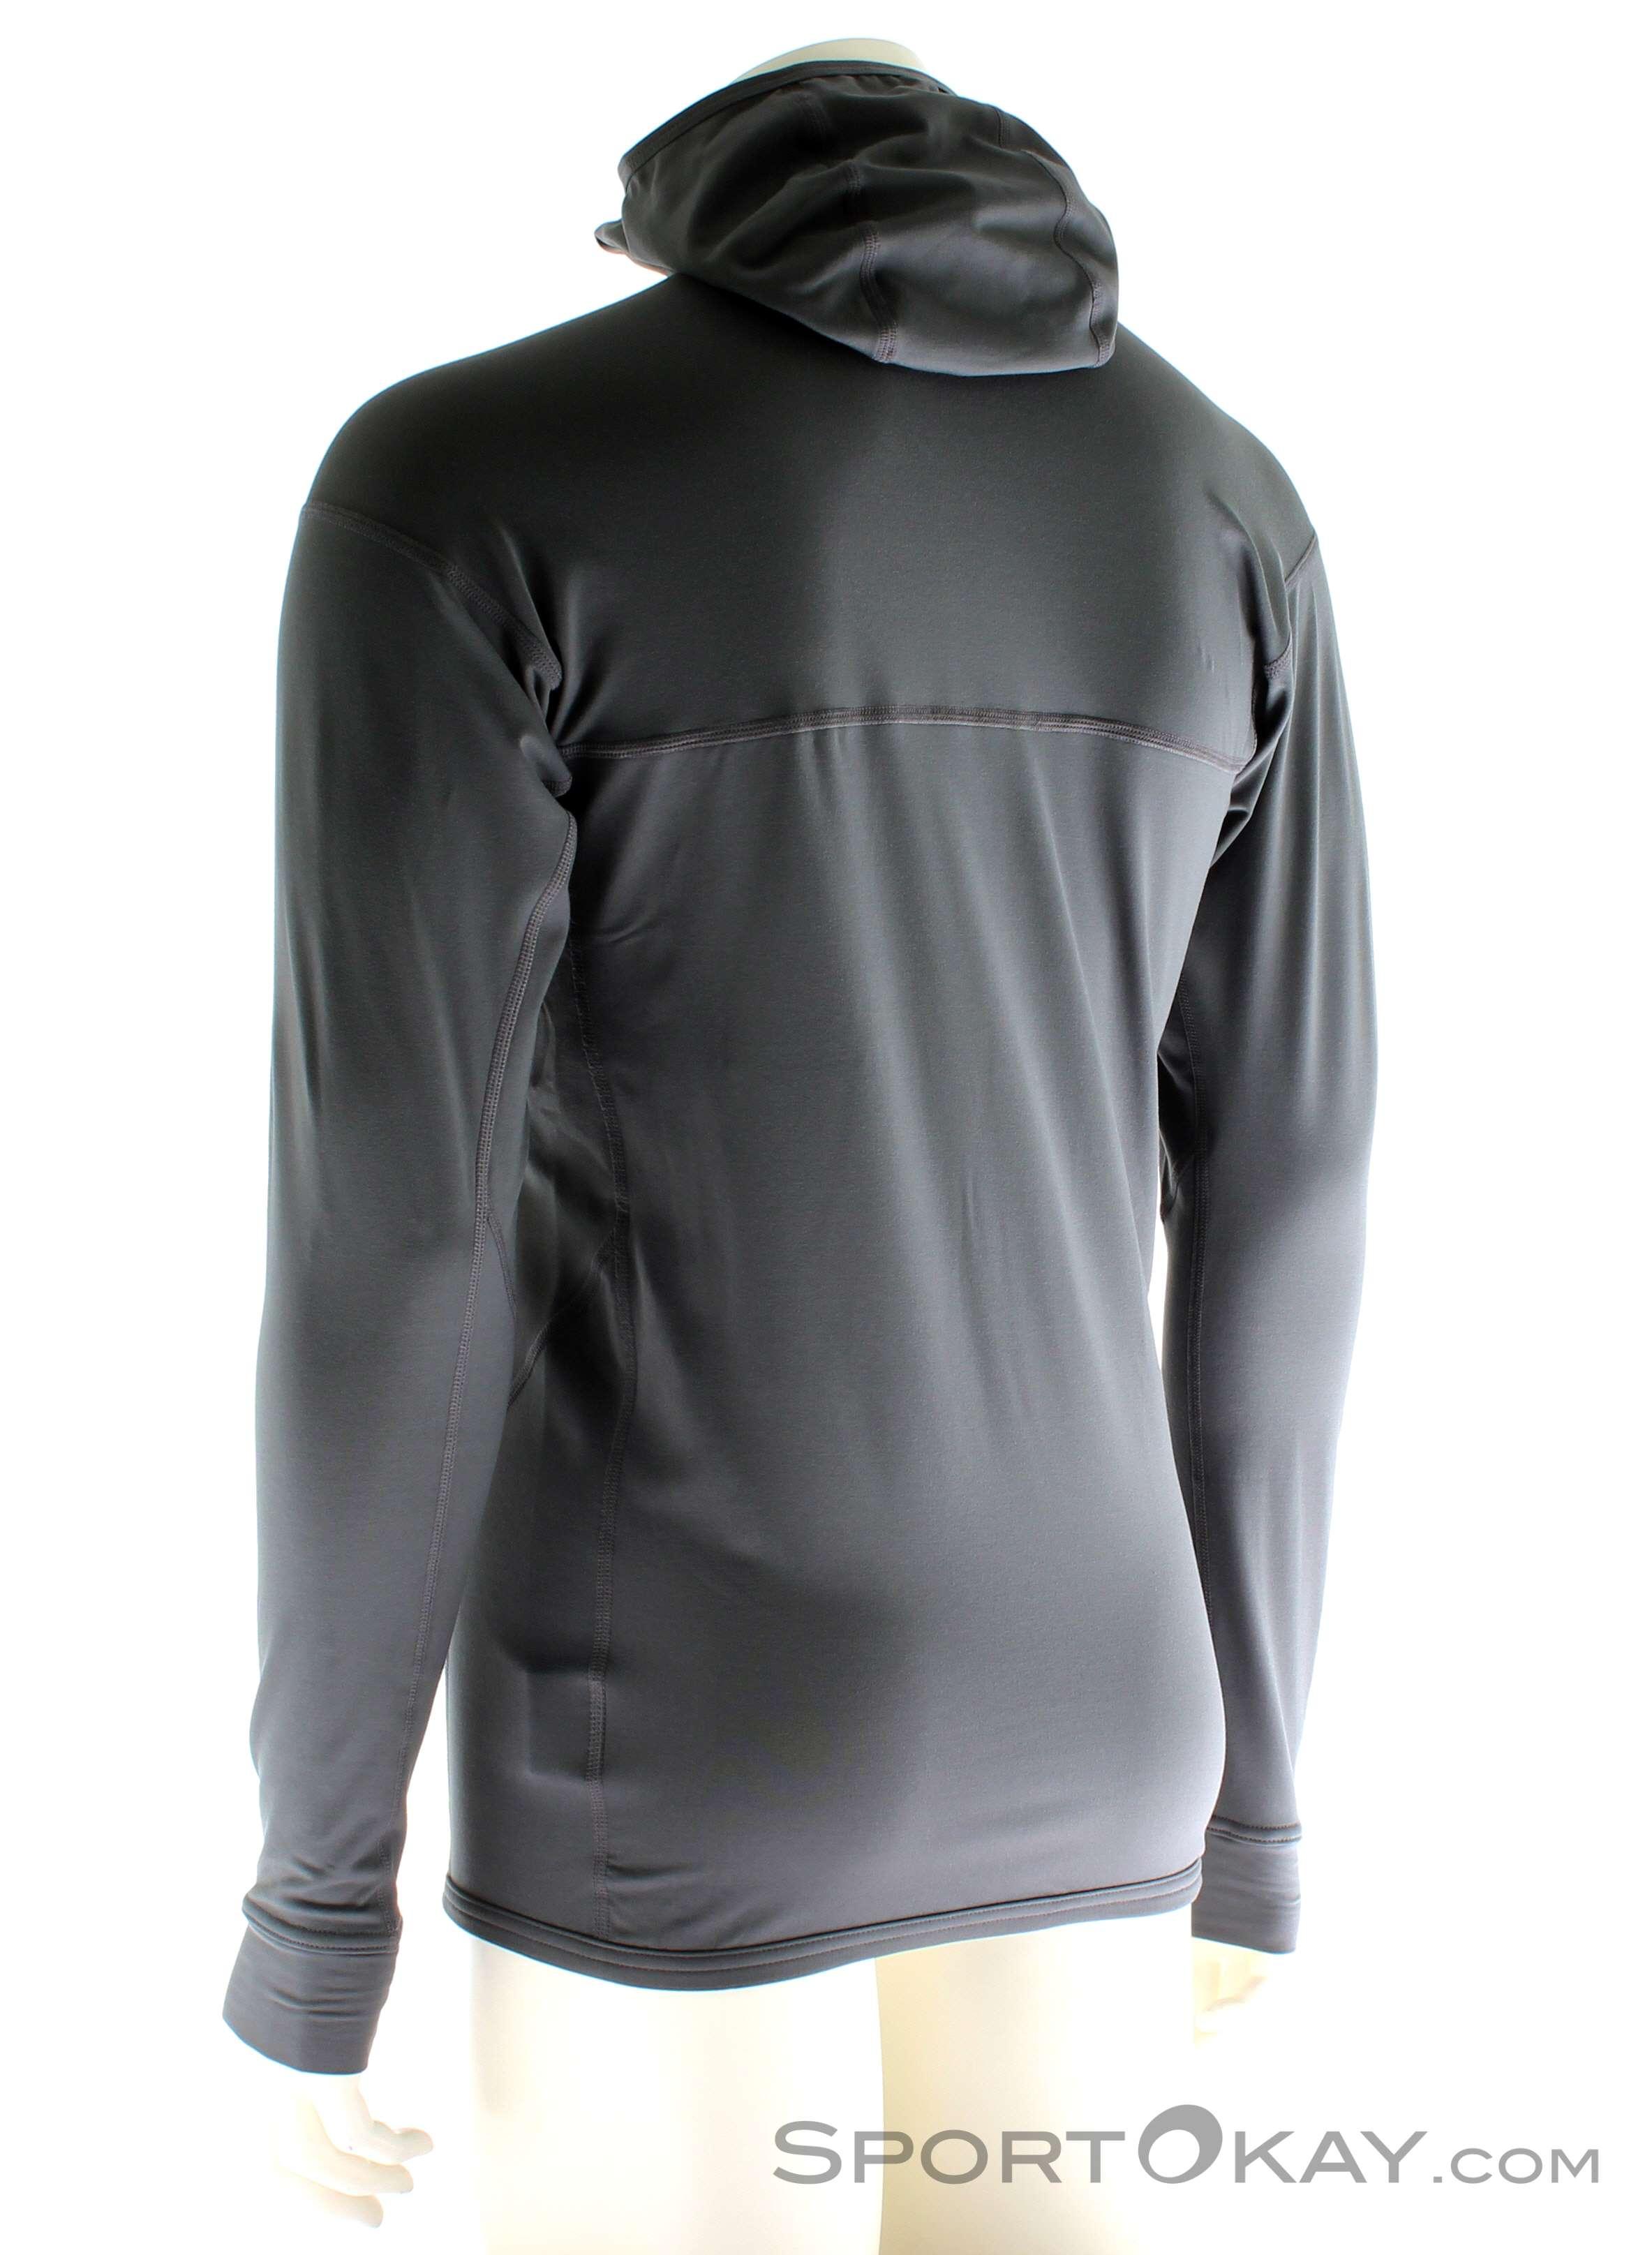 Hood Maglie Outdoor Maglia Abbigliamento Haglöfs Lithe Uomo 1wxz5BR8